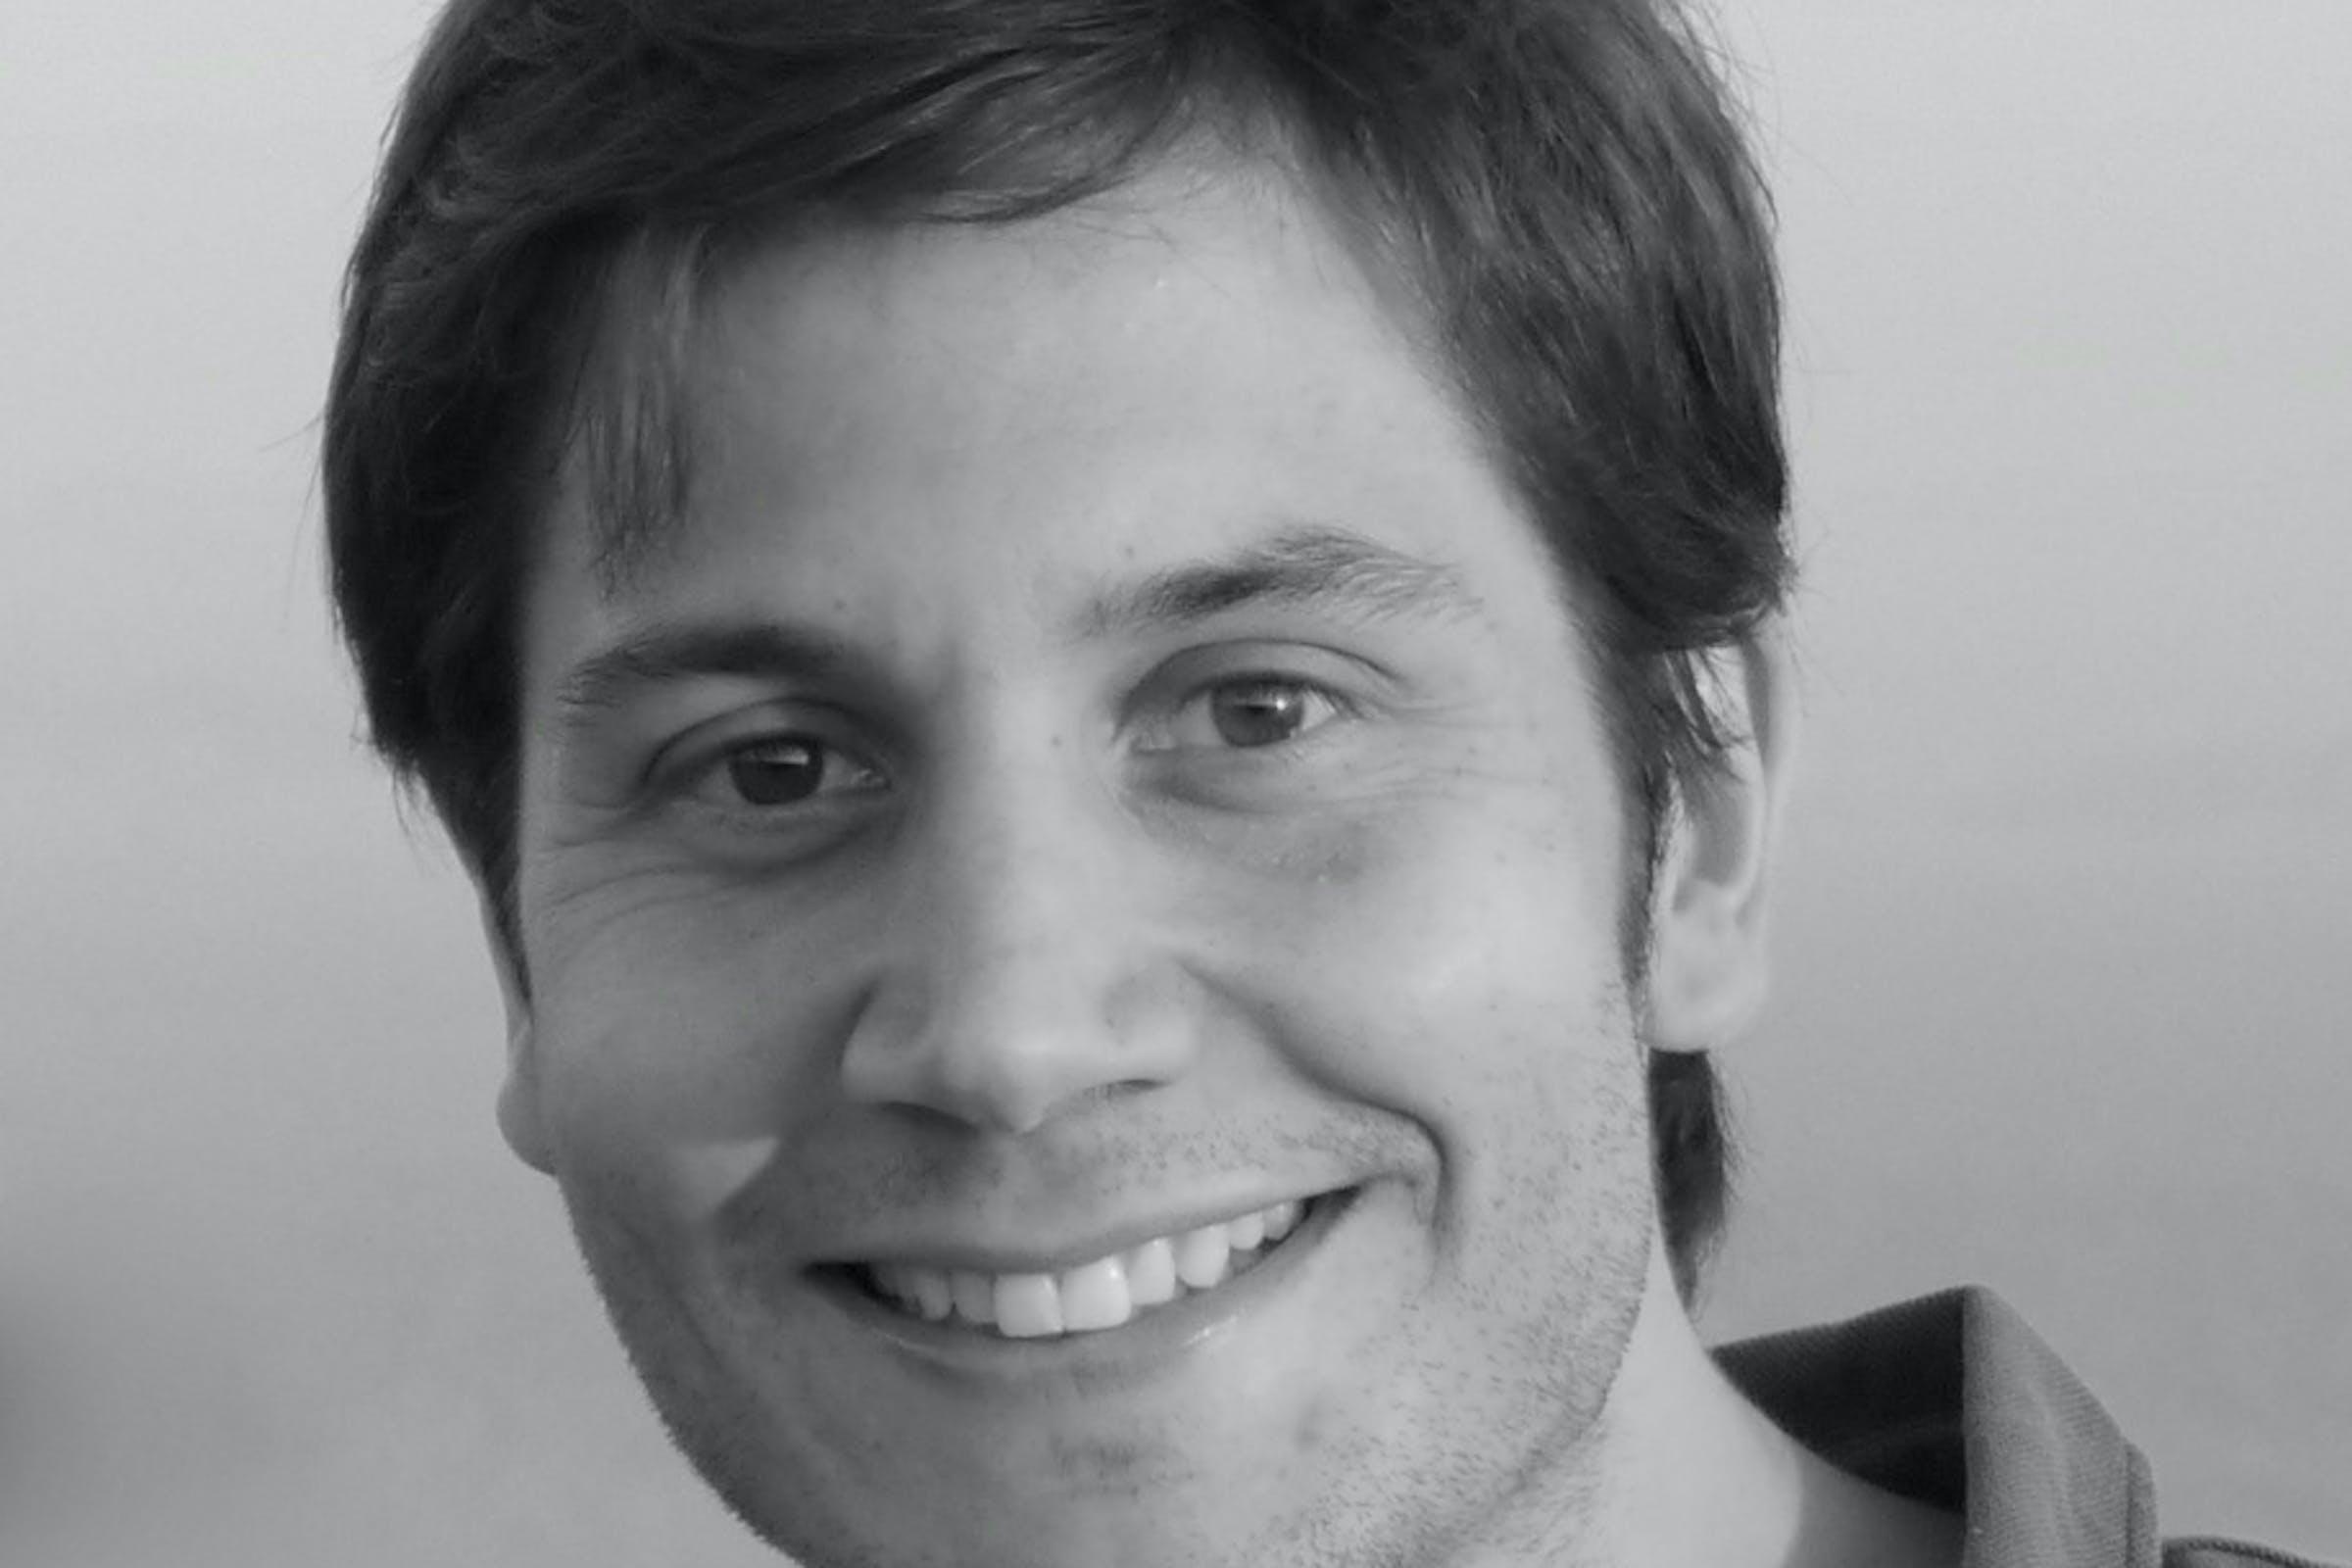 Headshot of Serge Verdoux from BackMarket